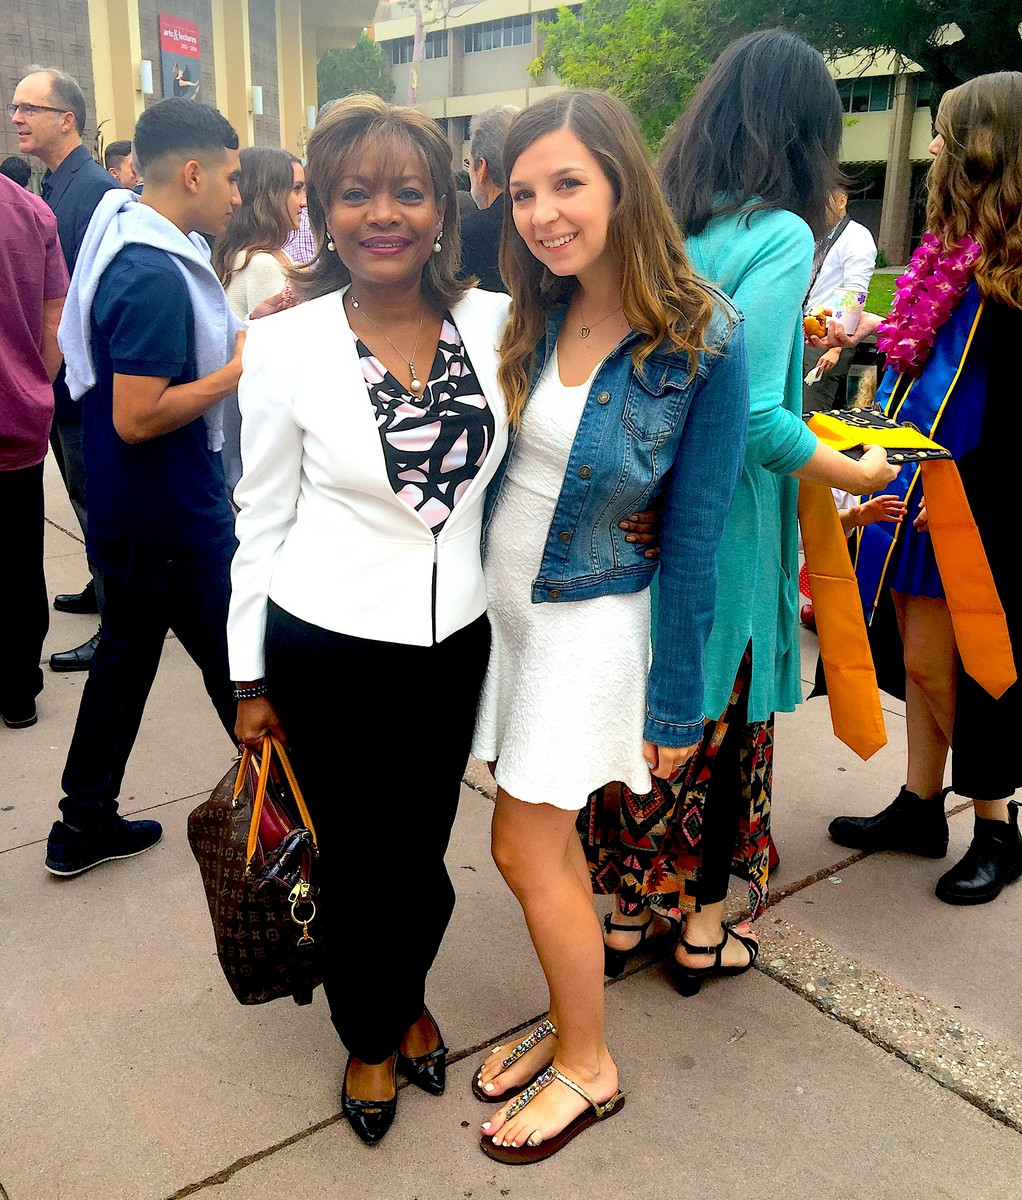 Graduation Day Student#3 2016